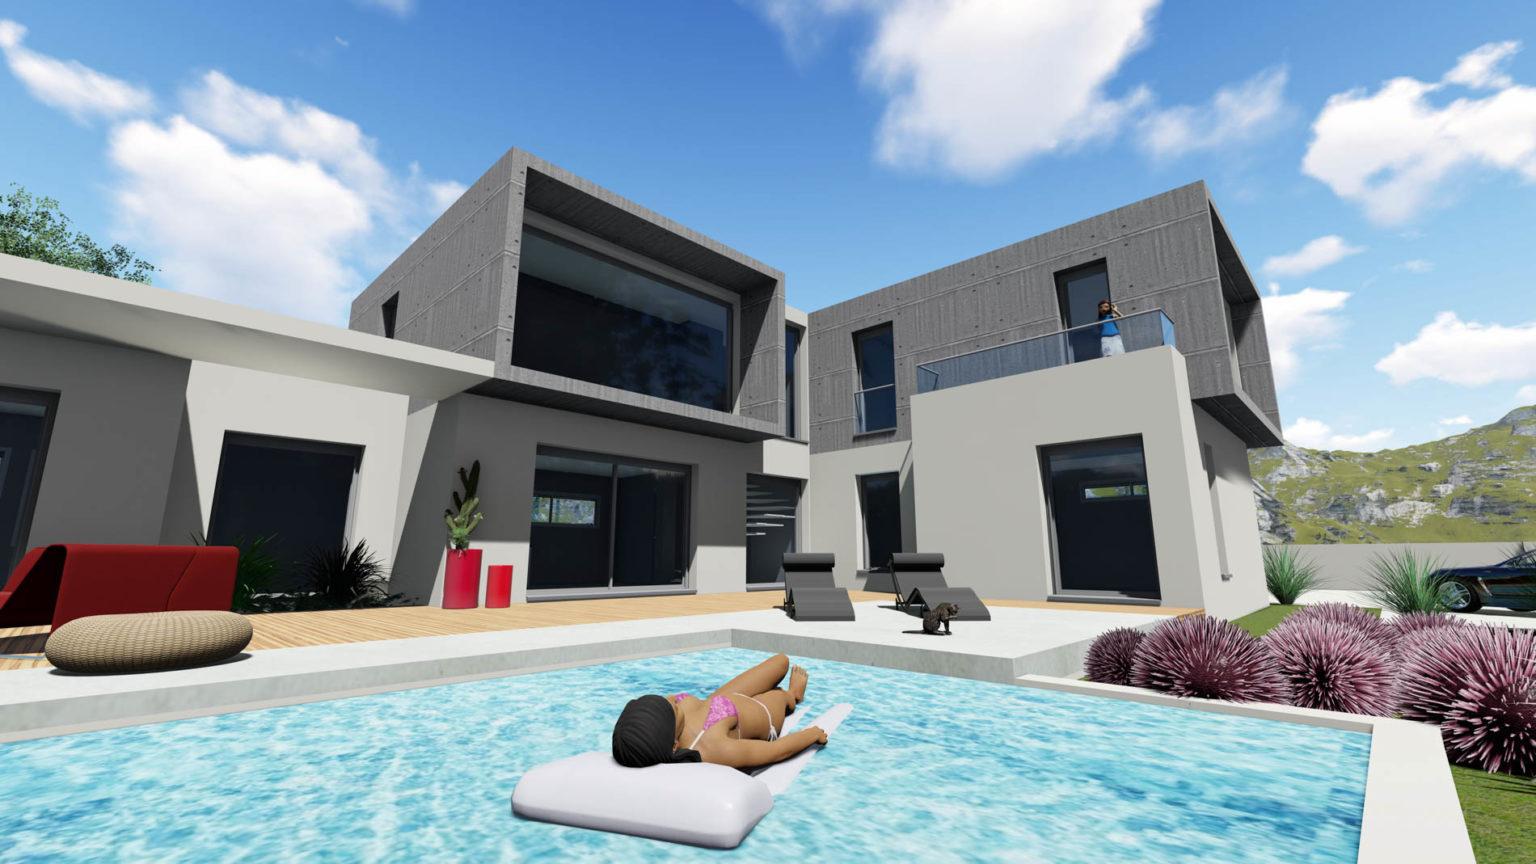 villa-contemporaine-krim-05